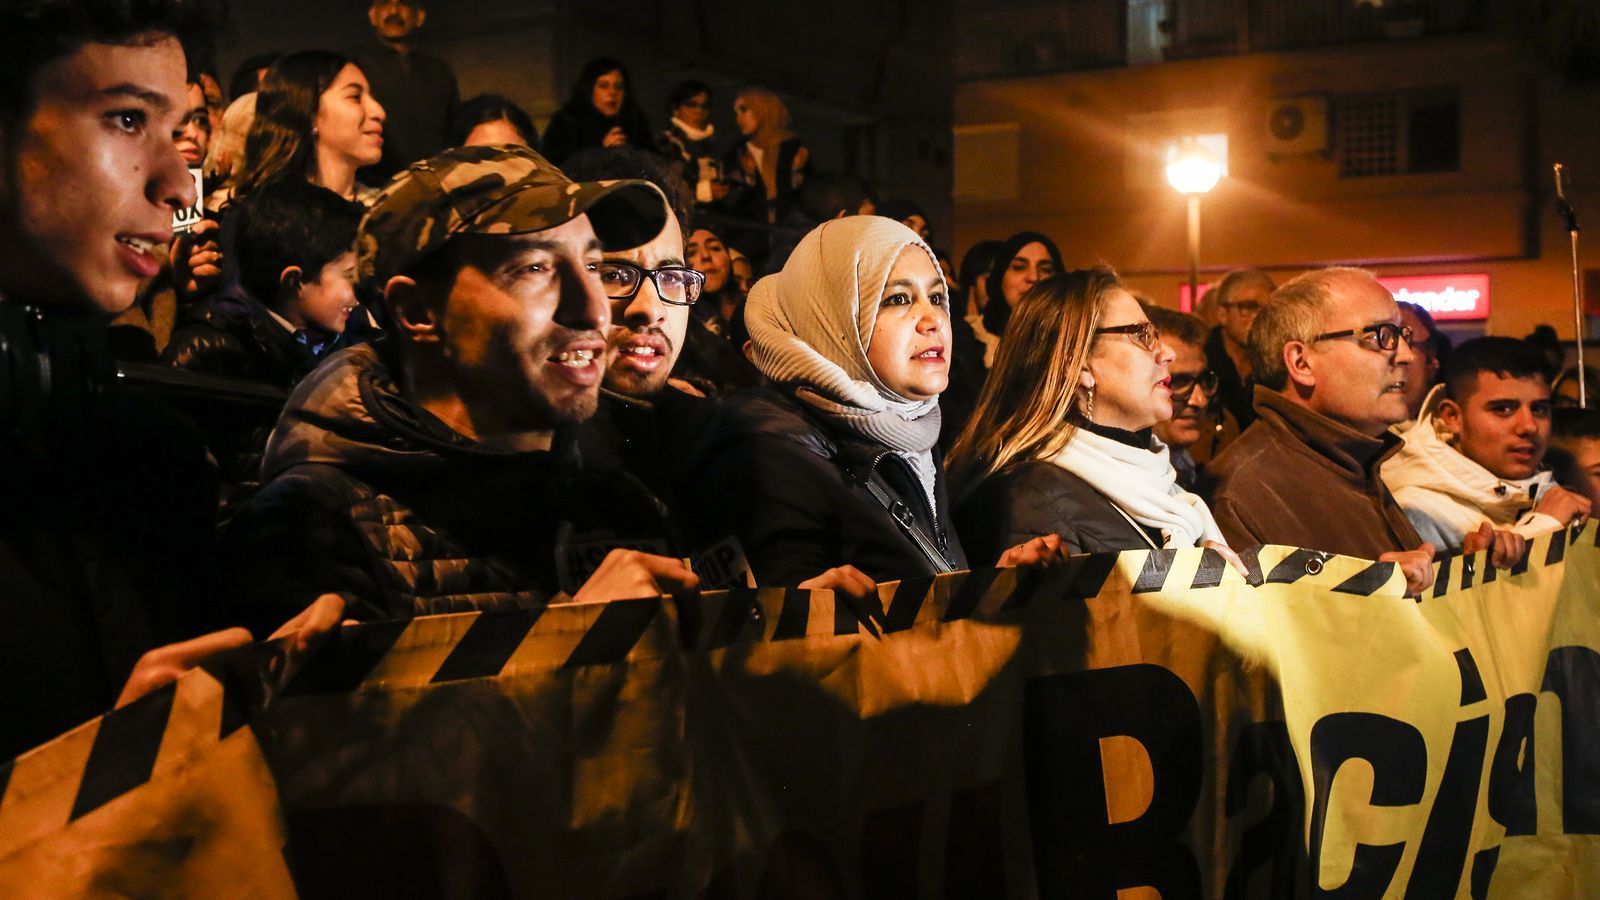 Un centenar de persones es manifesten contra l'agressió racista